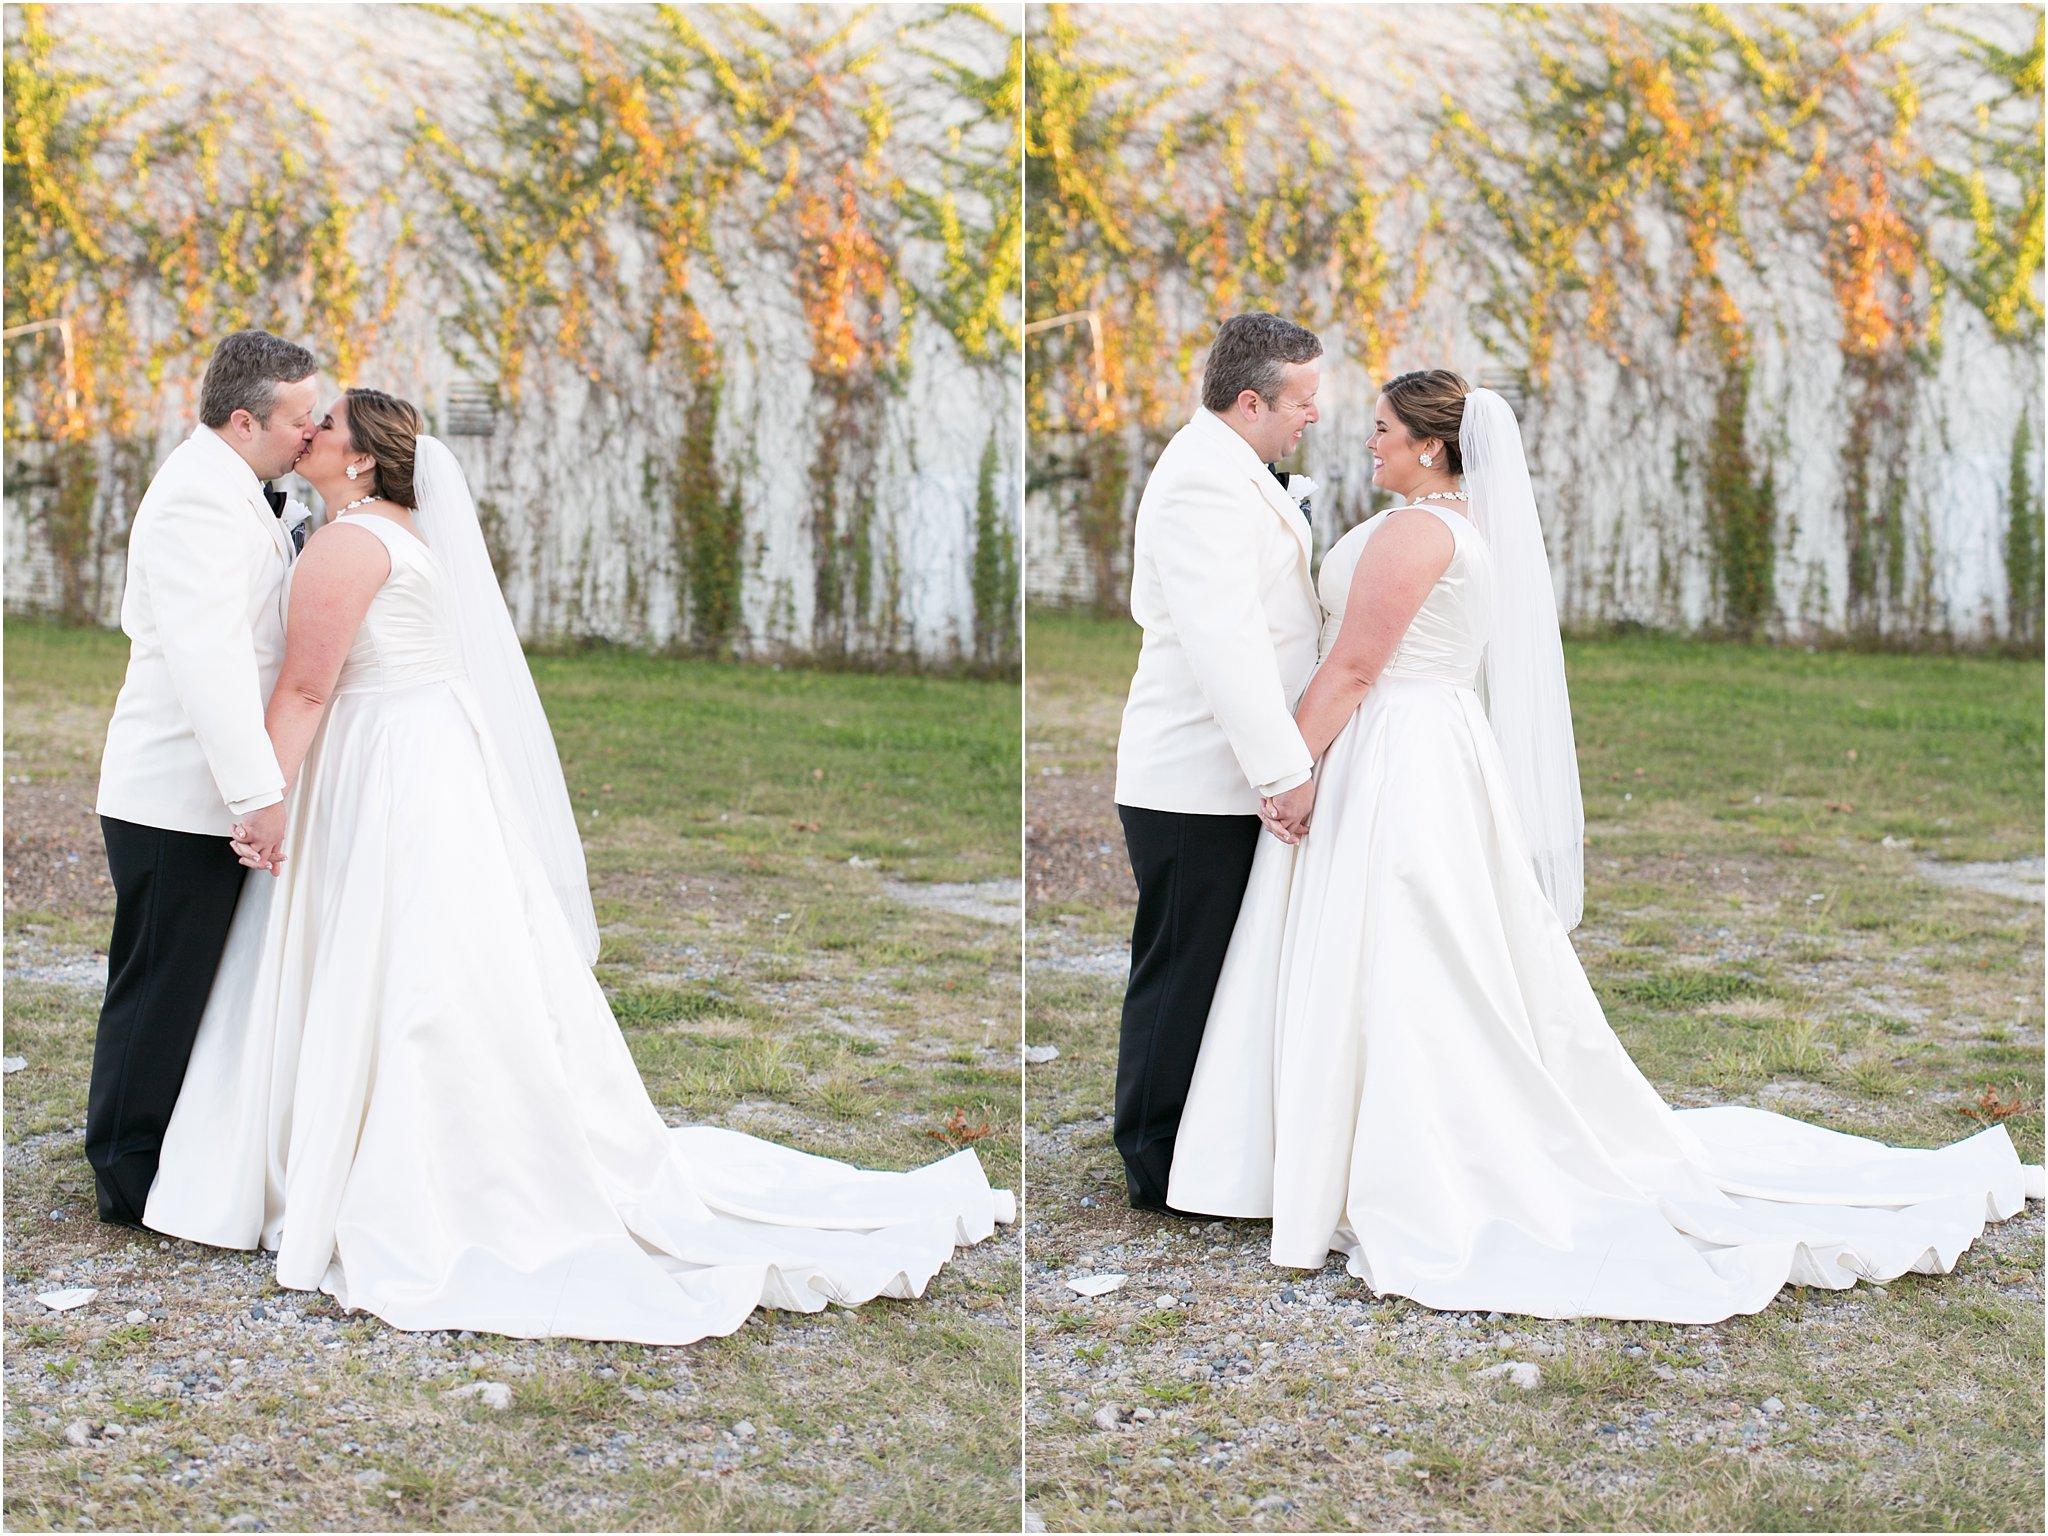 va_jessica_ryan_photography_virginia_wedding_norfolk_harrison_opera_house_norfolk_arts_district_portraits_3828